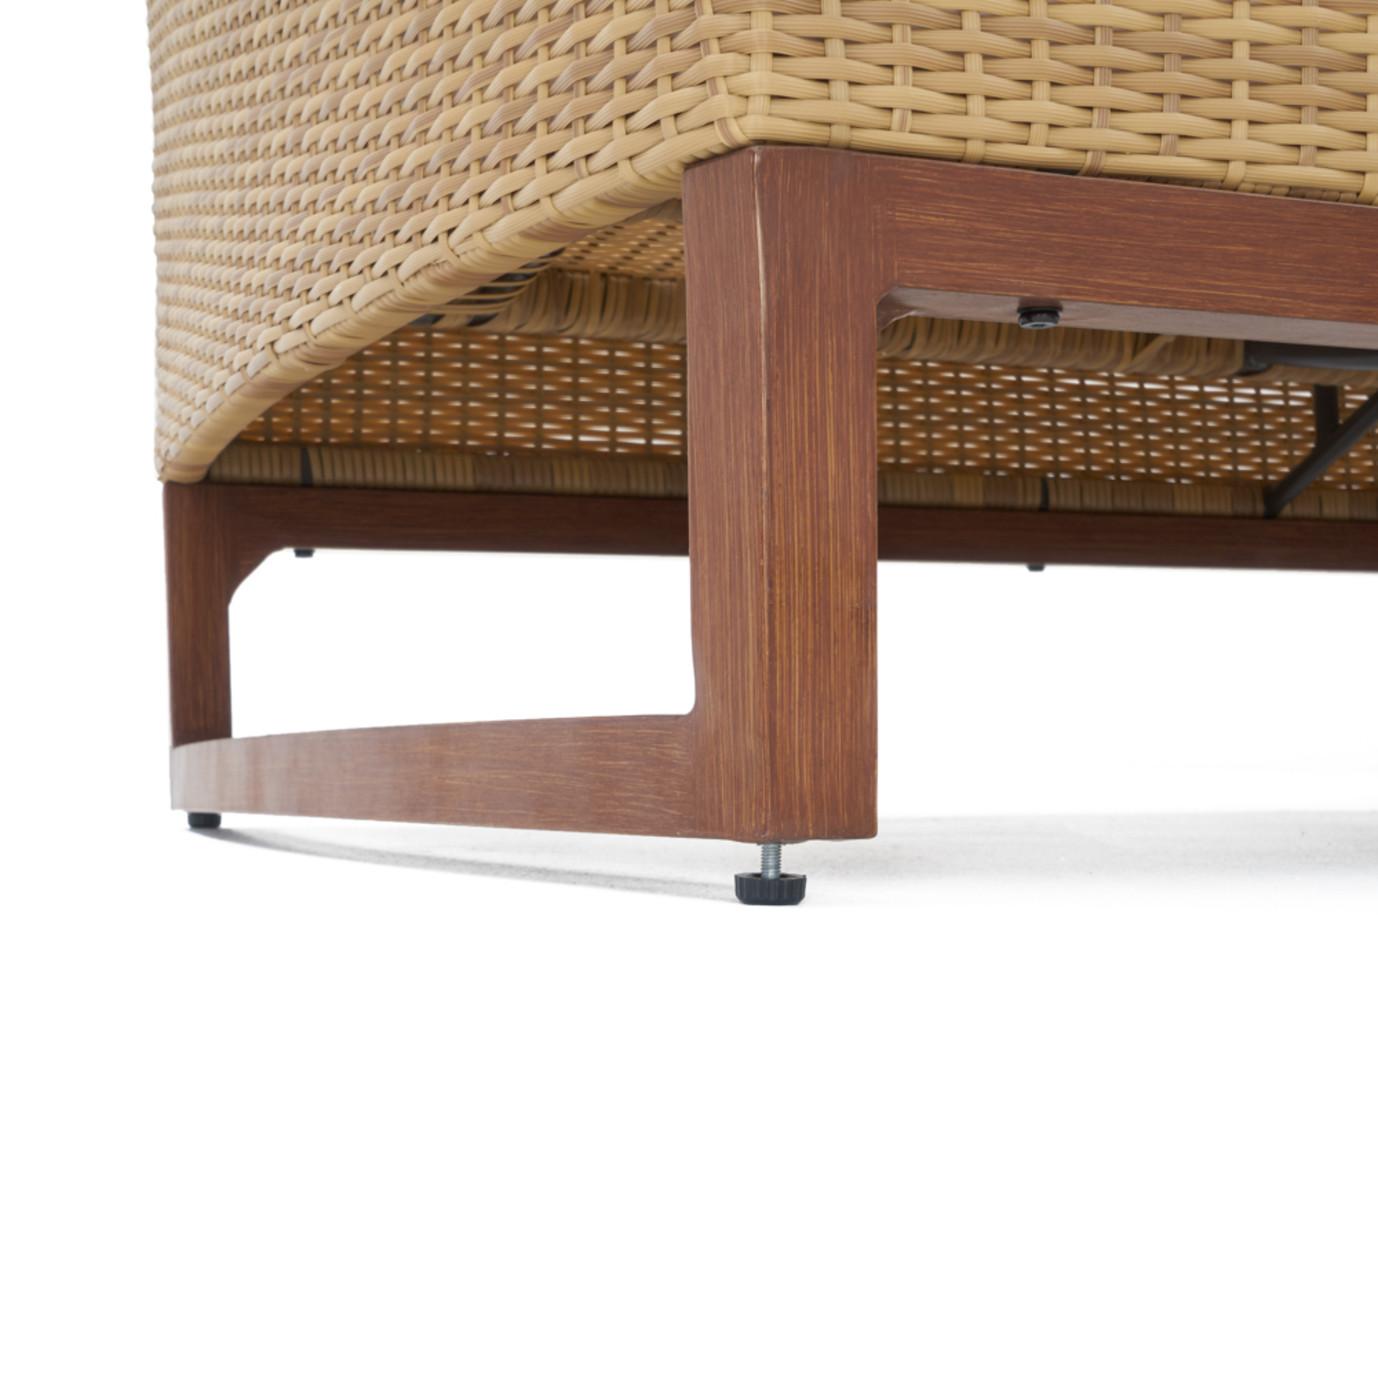 Mili™ 8 Piece Deep Seating Set - Maxim Beige